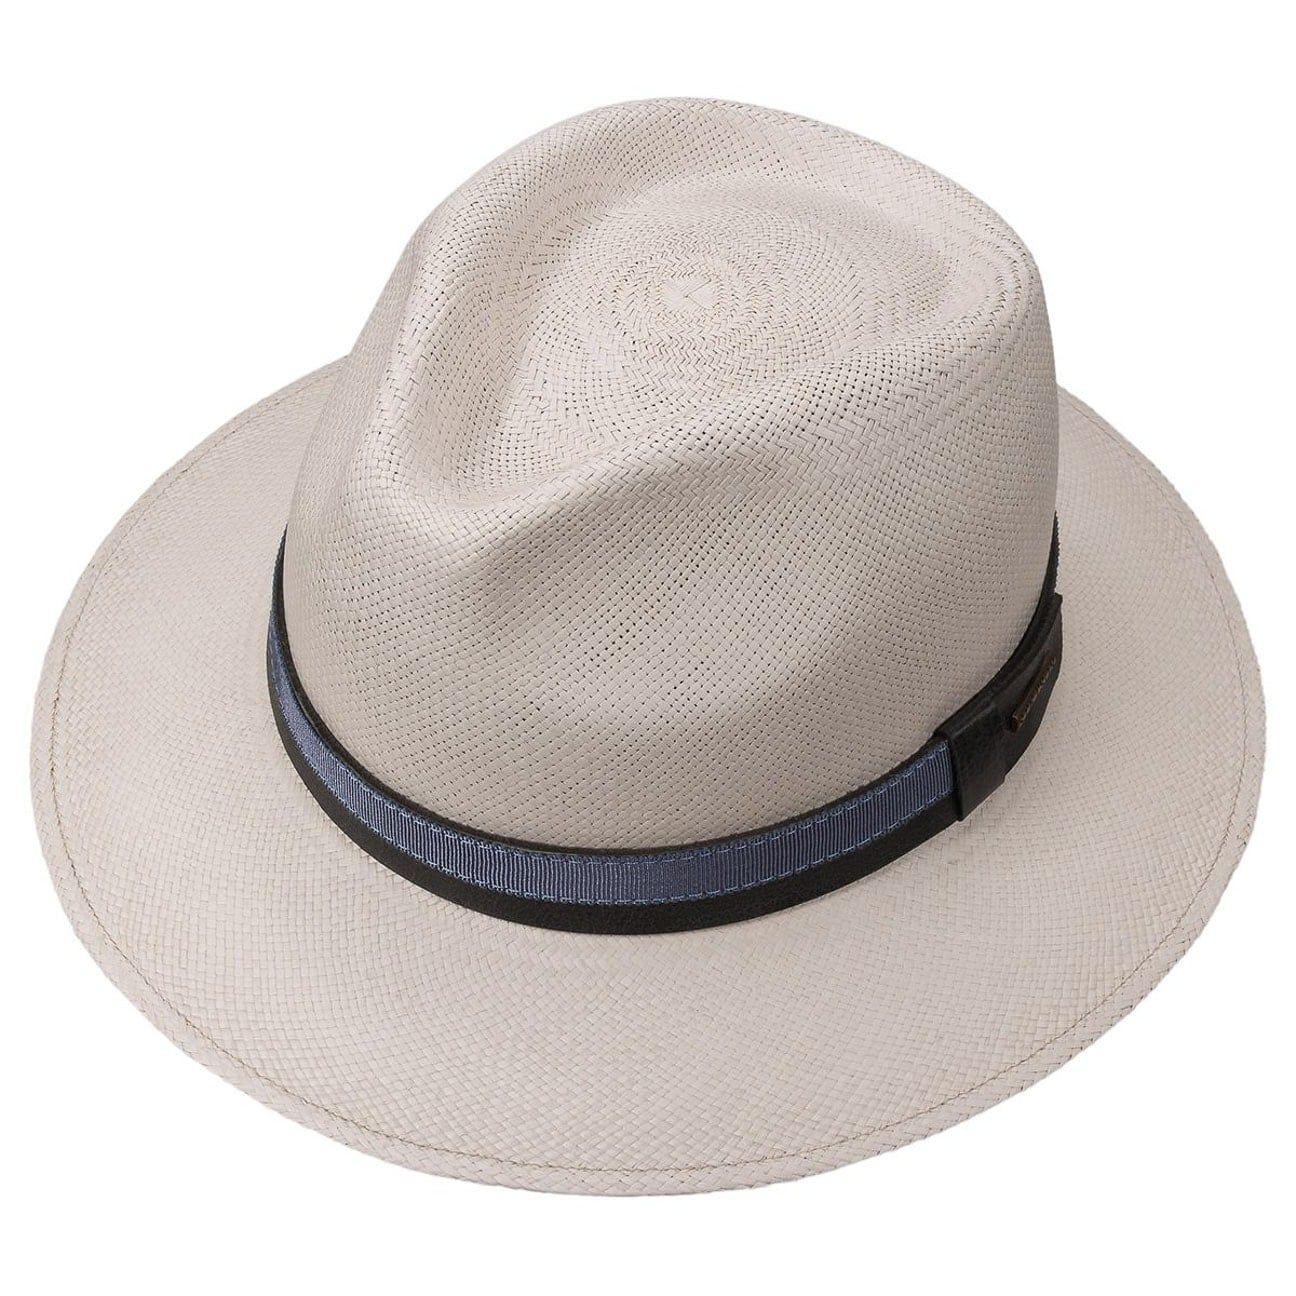 Pinecrest Panama Straw Hat oatmeal